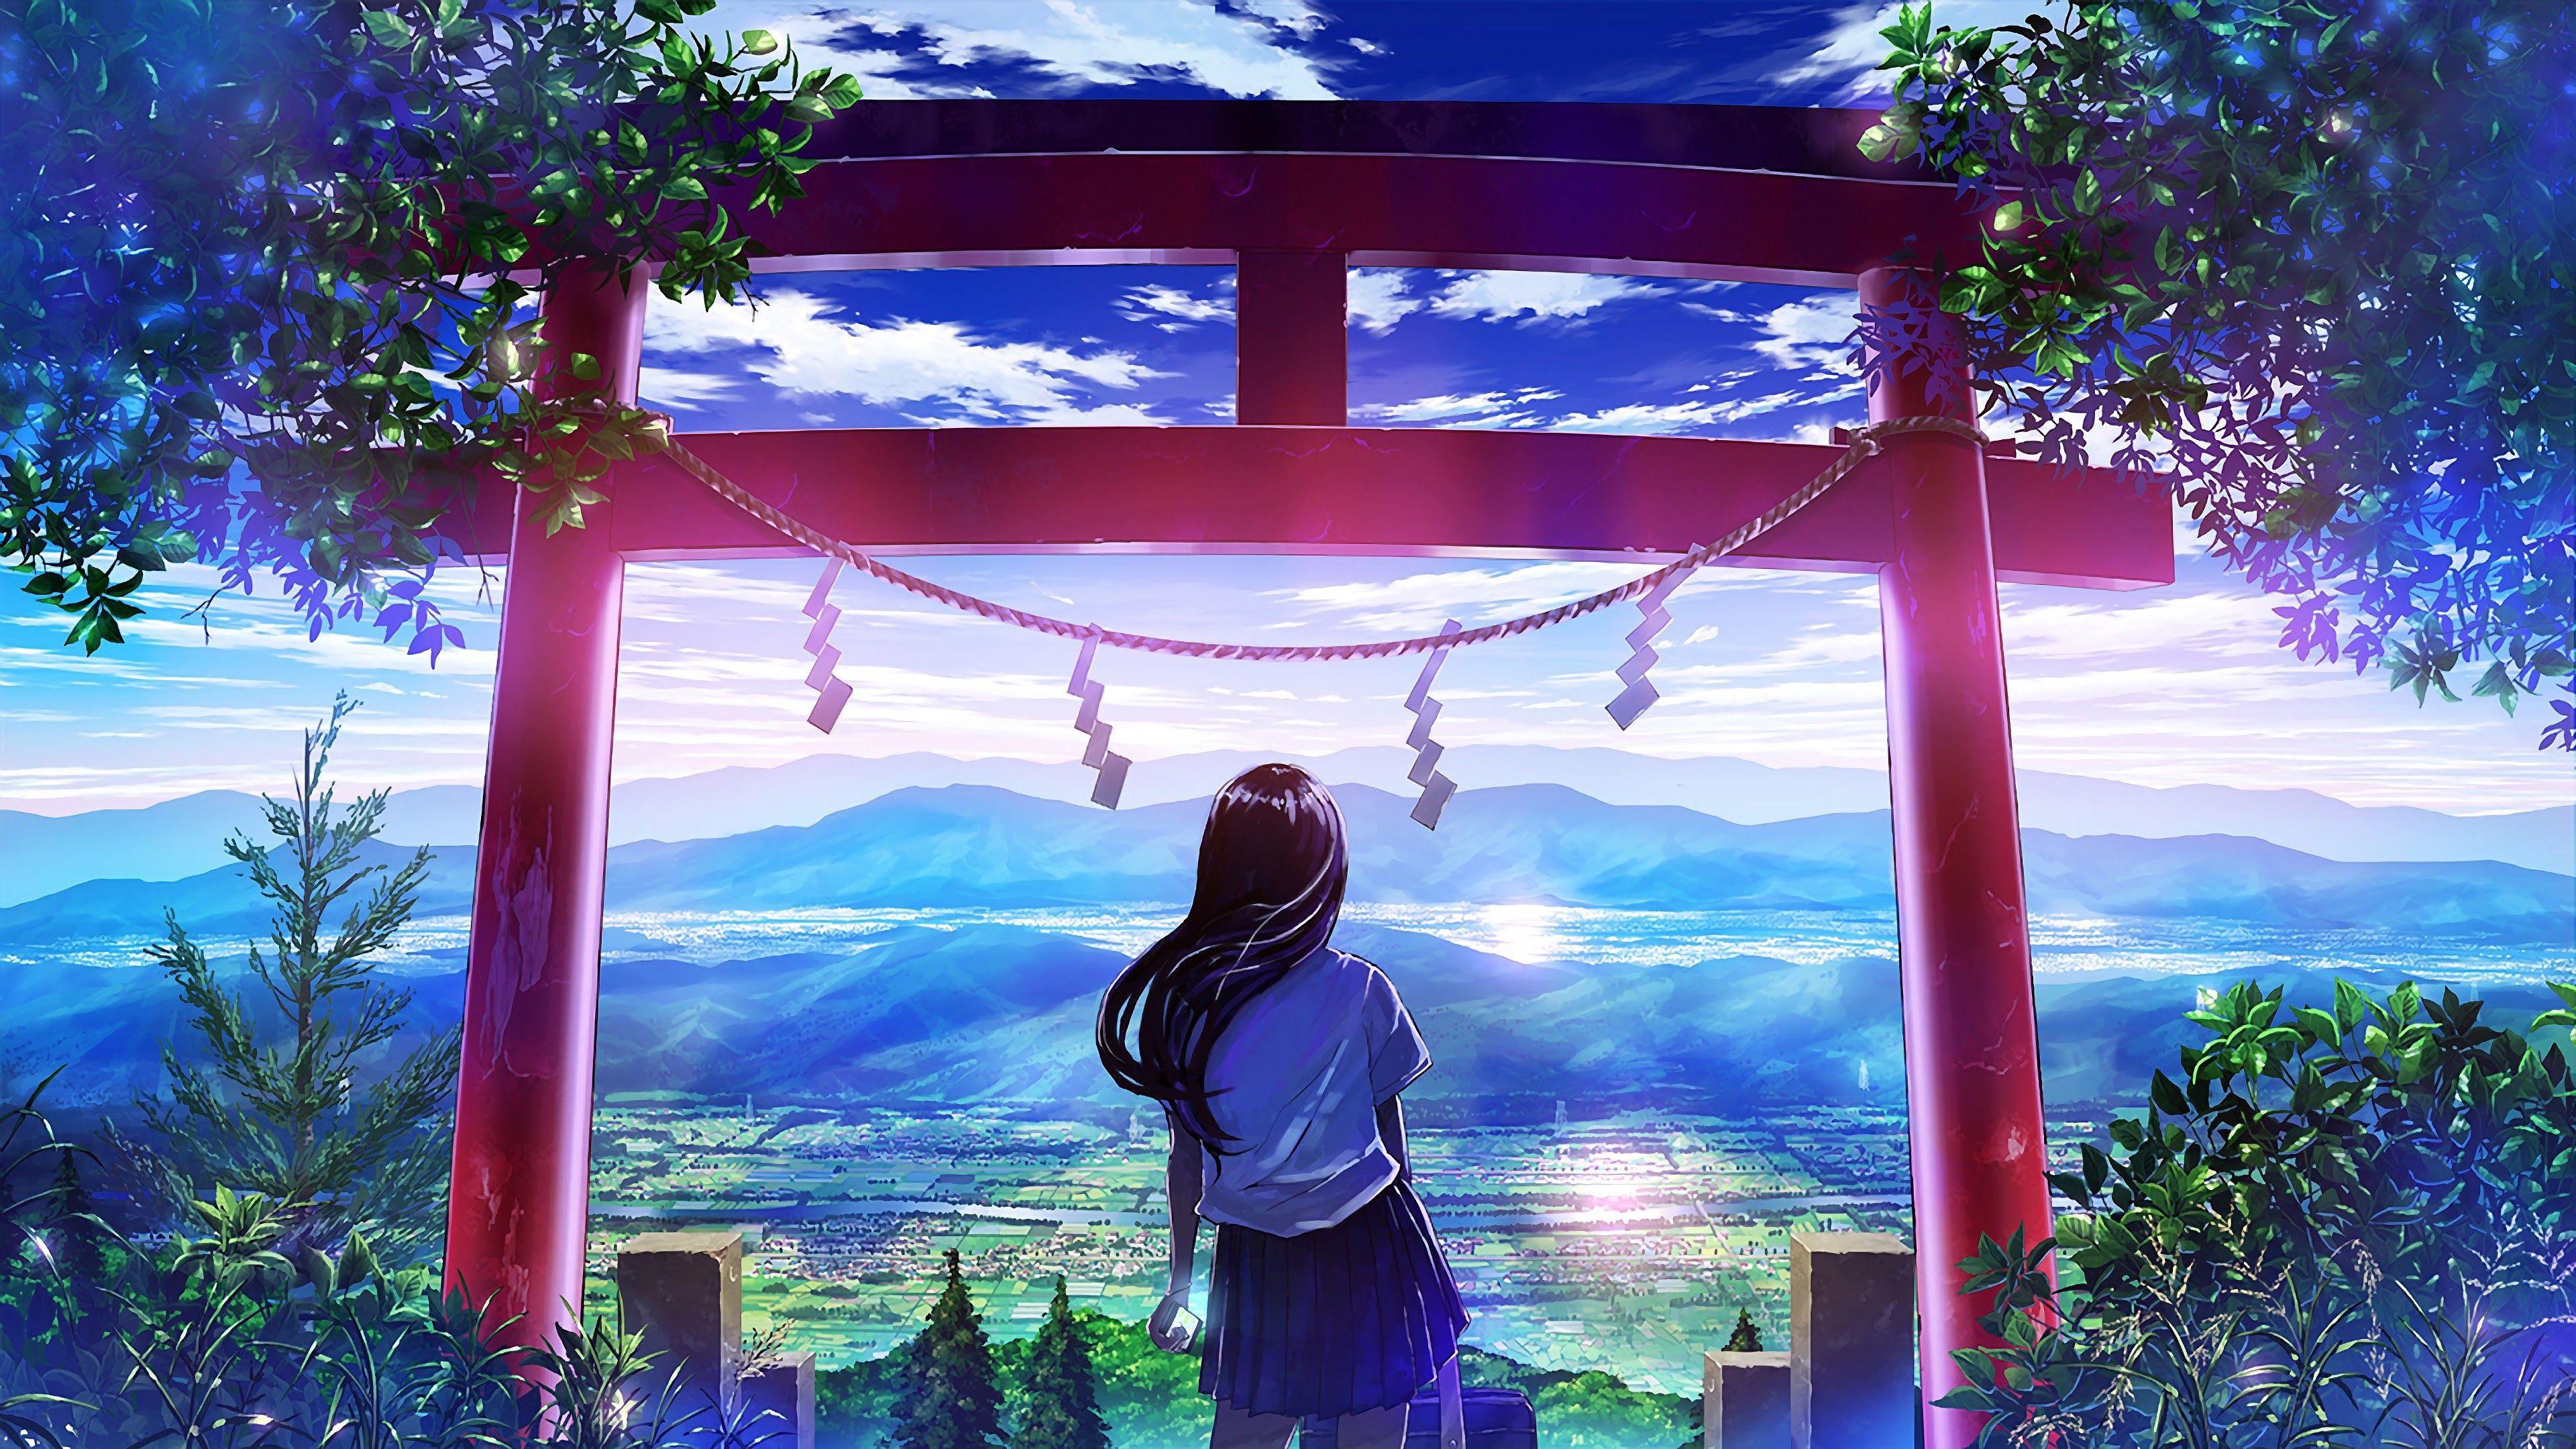 PC 4k Japan Anime Wallpapers - Wallpaper Cave